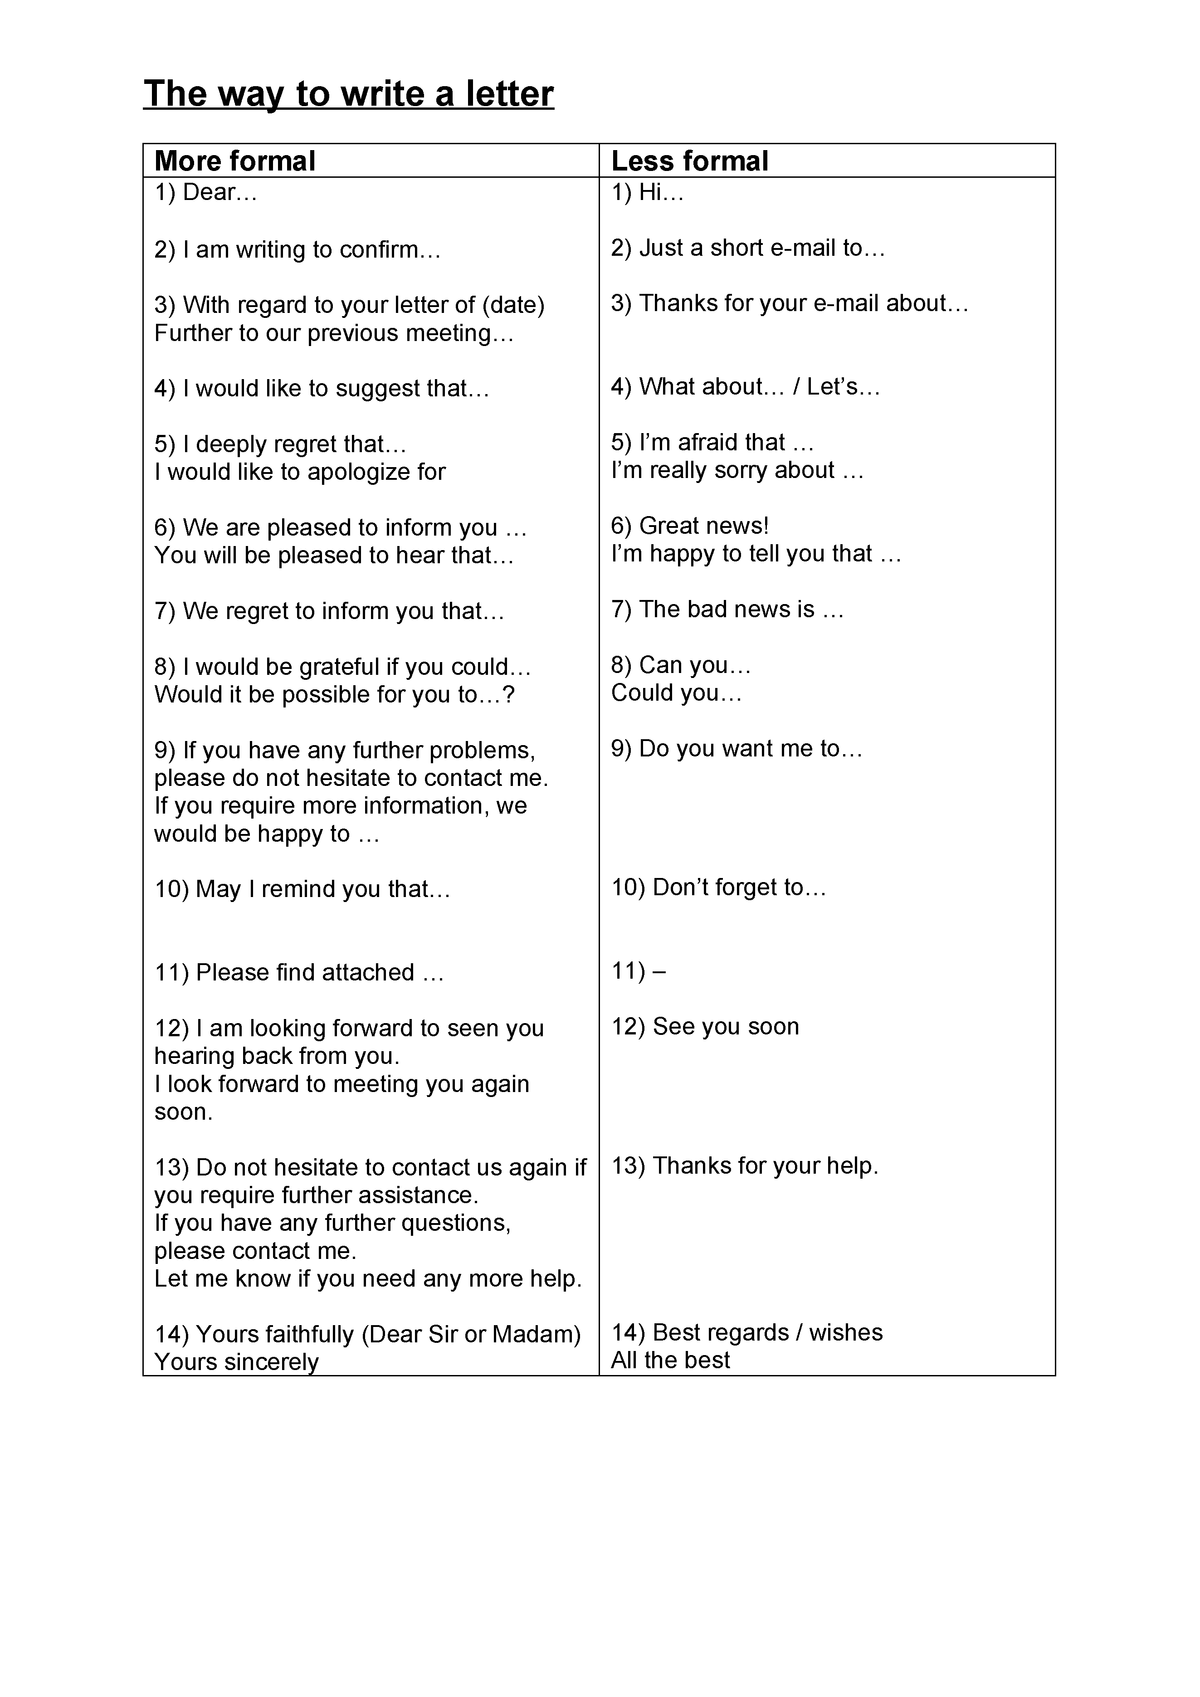 The way to write a letter B2-C1 - Anglais - HES-SO - StuDocu